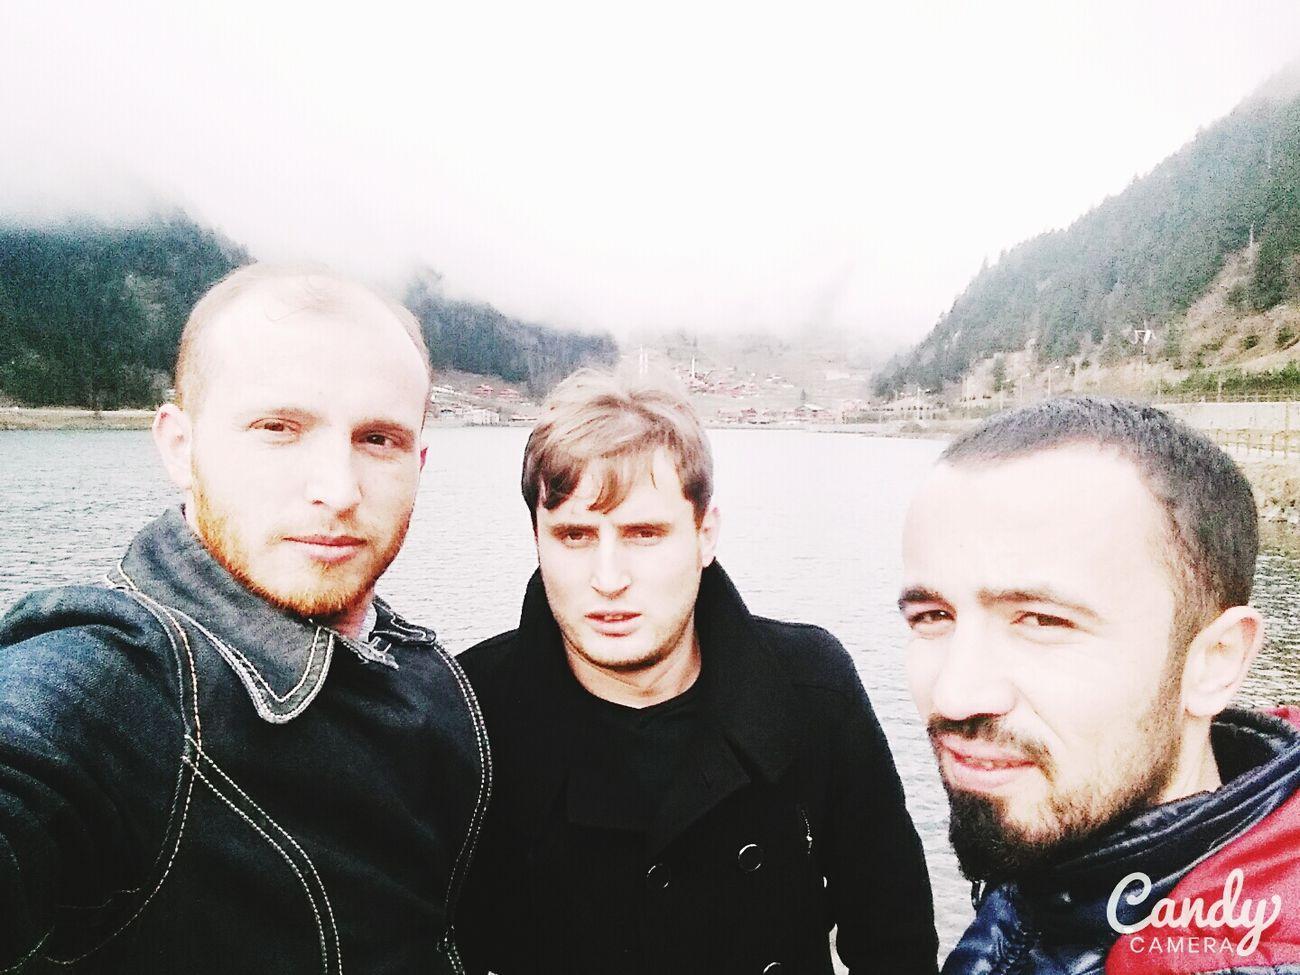 Trabzon Uzungol Turkey Dostlarla Kahvaltizamani